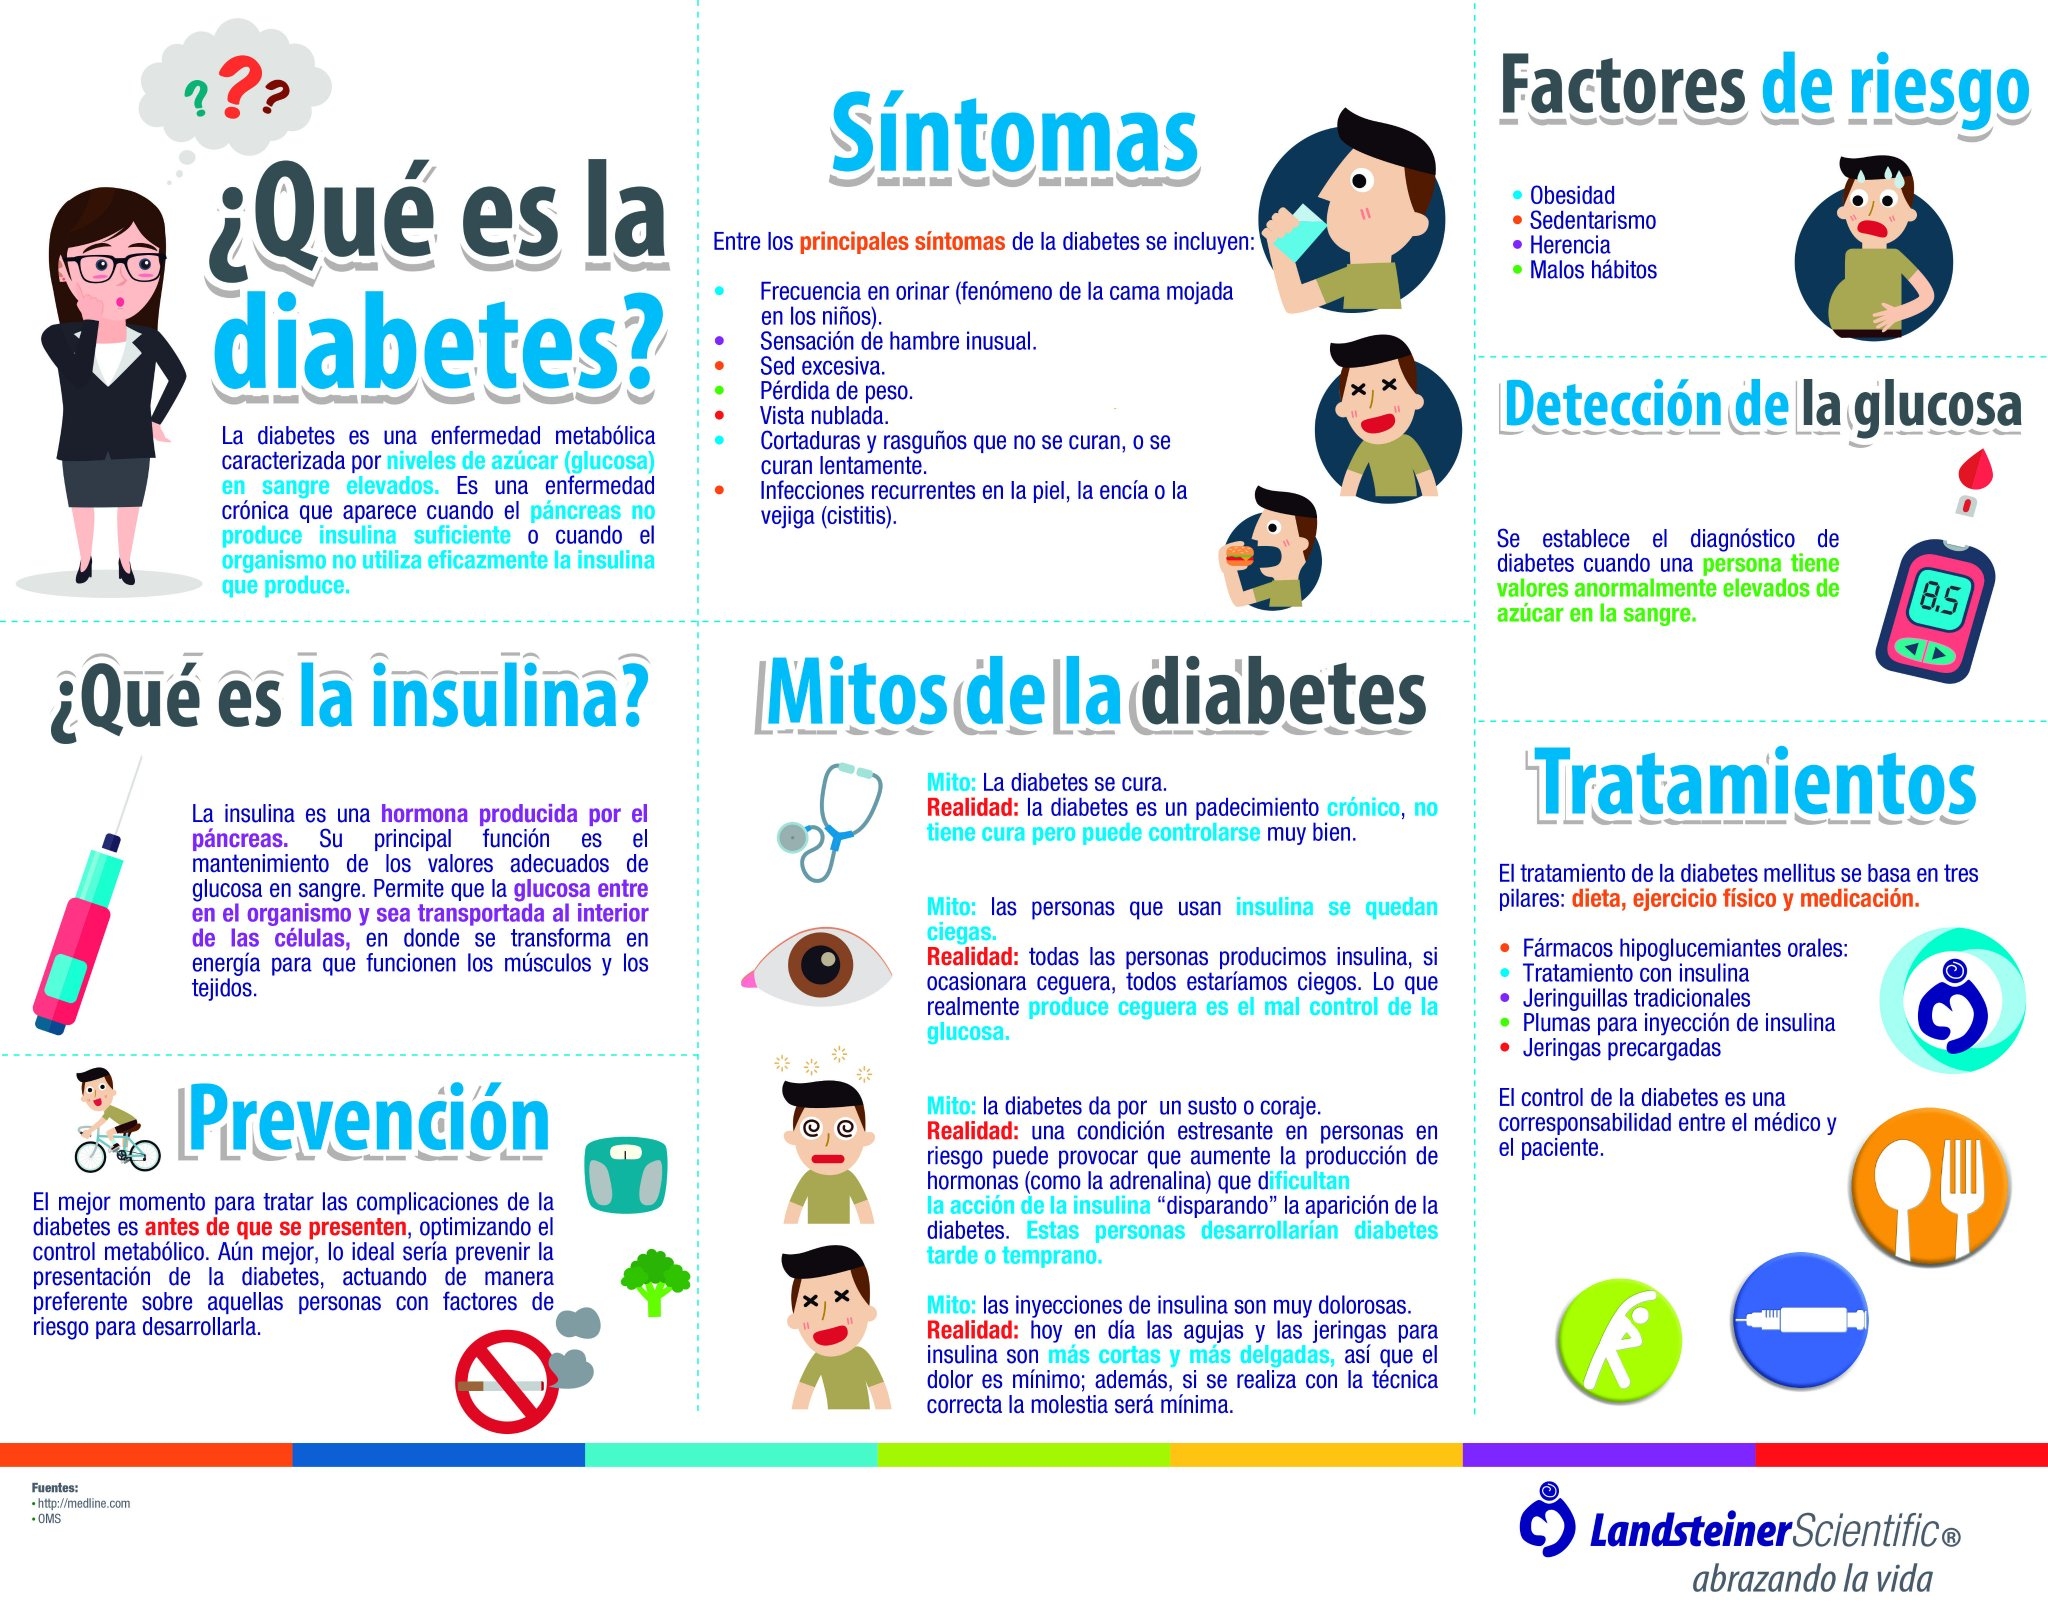 Farmacos hipoglucemiantes que producen perdida de pesos